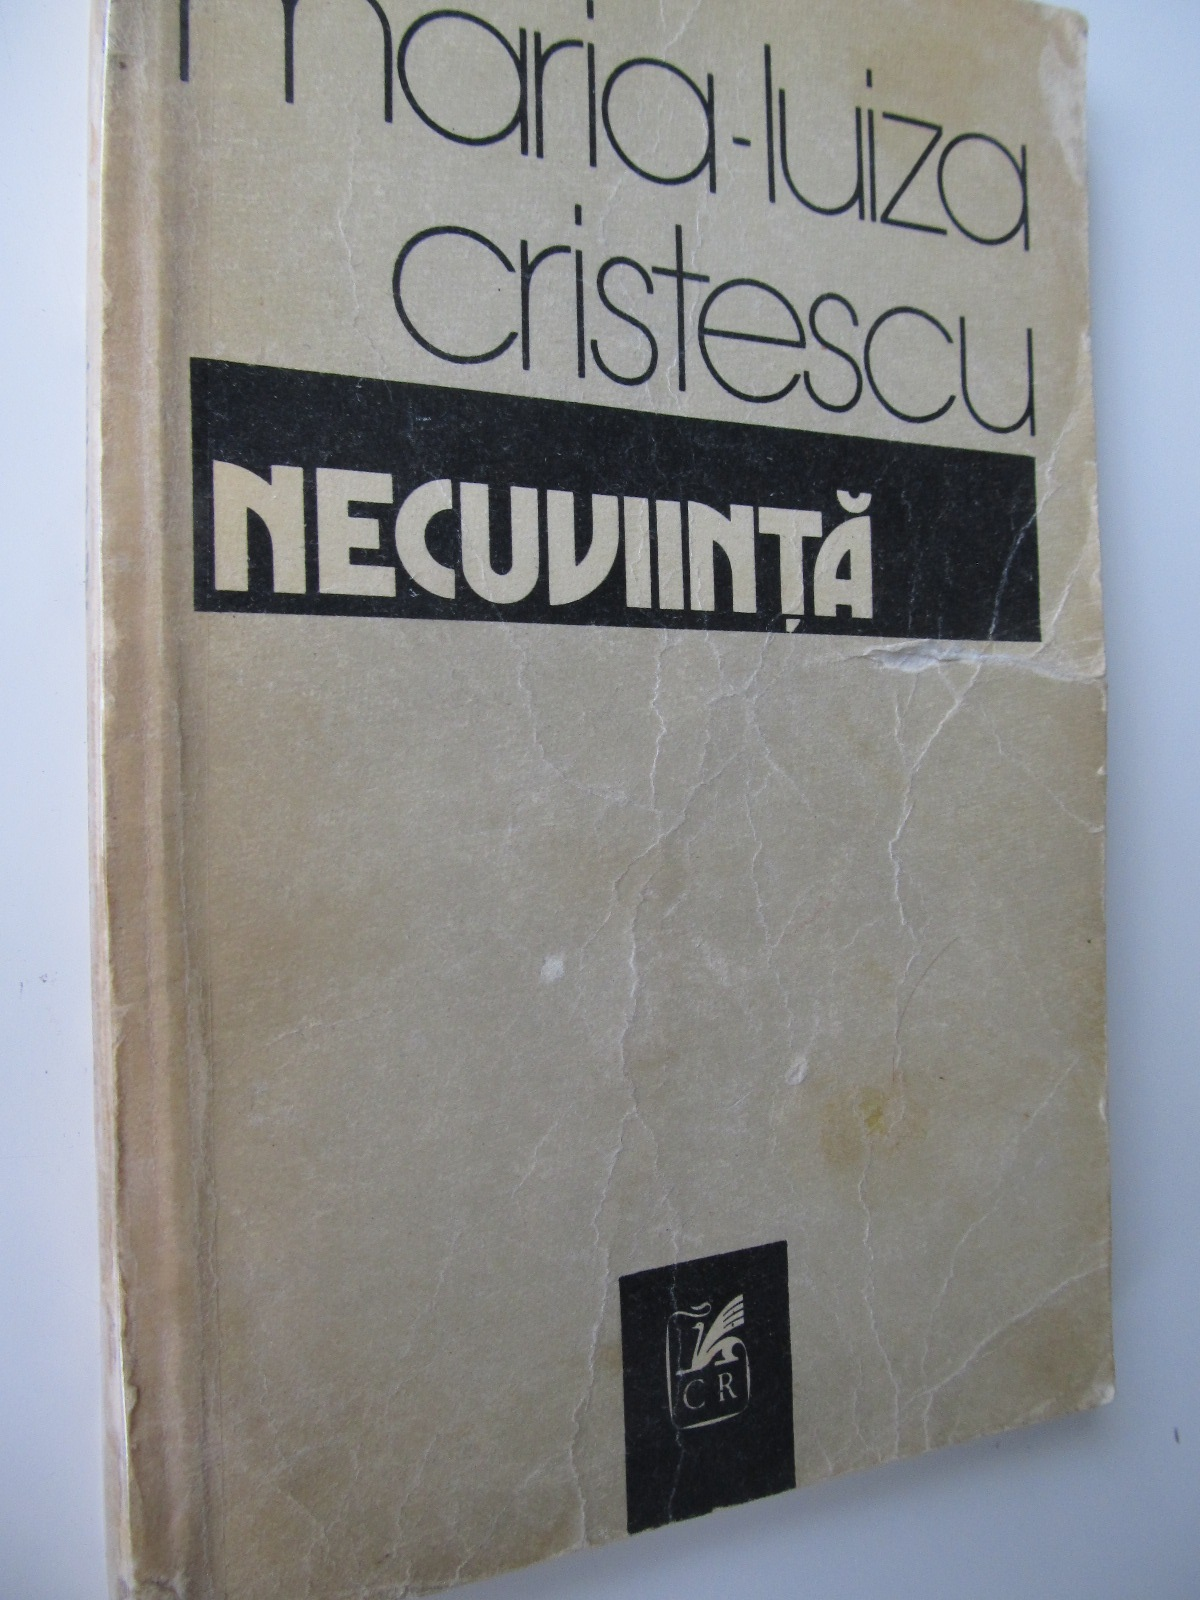 Necuviinta - Maria Luiza Cristescu | Detalii carte